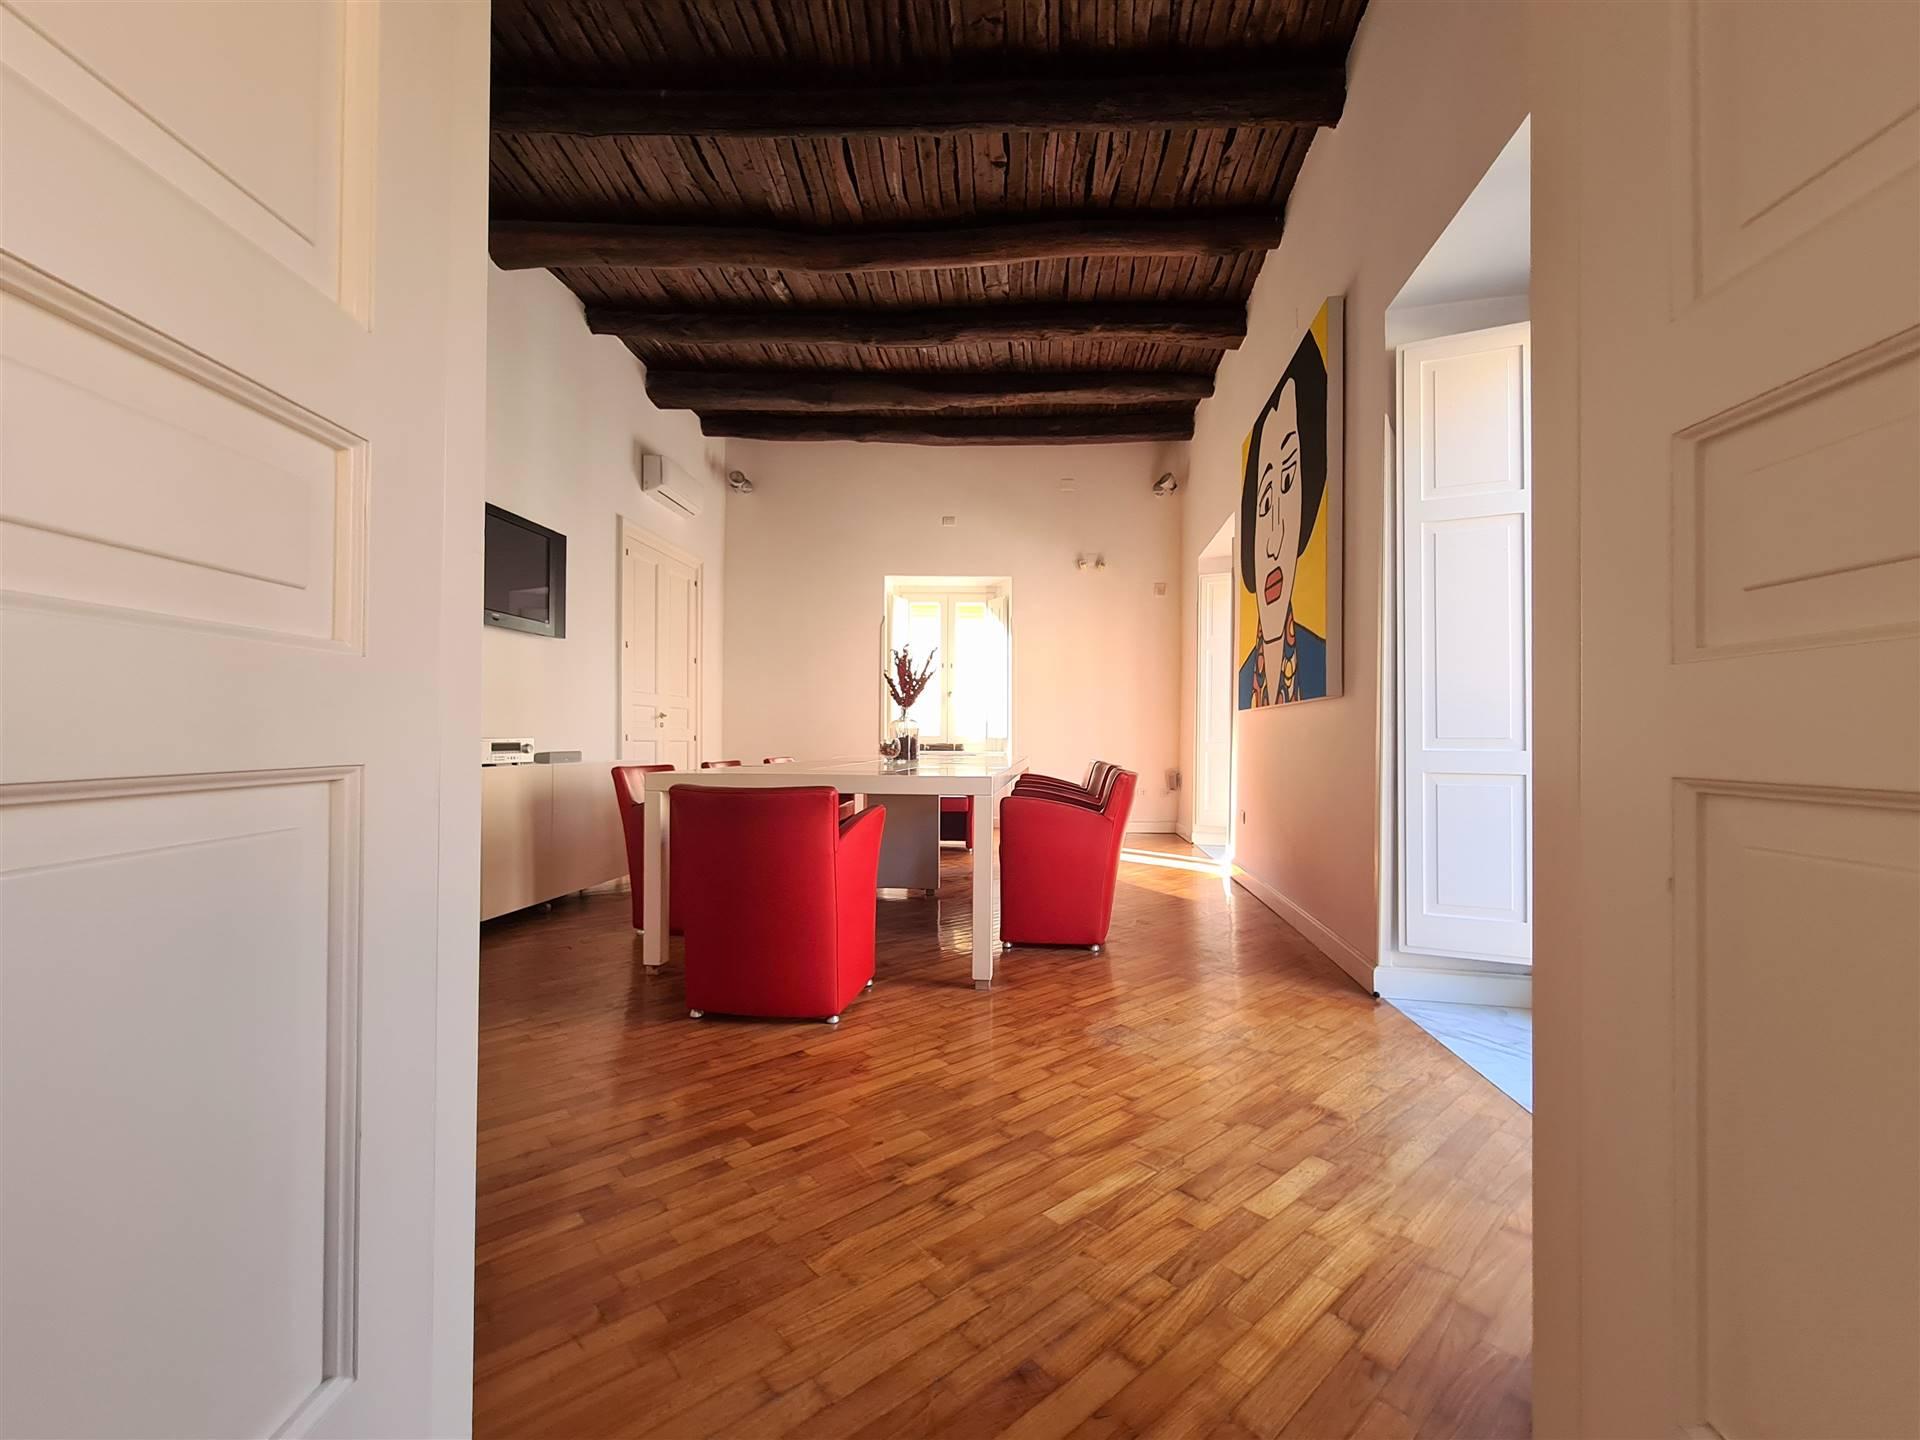 AV925A-Appartamento-SANTA-MARIA-CAPUA-VETERE-Via-Antonio-Simoncelli